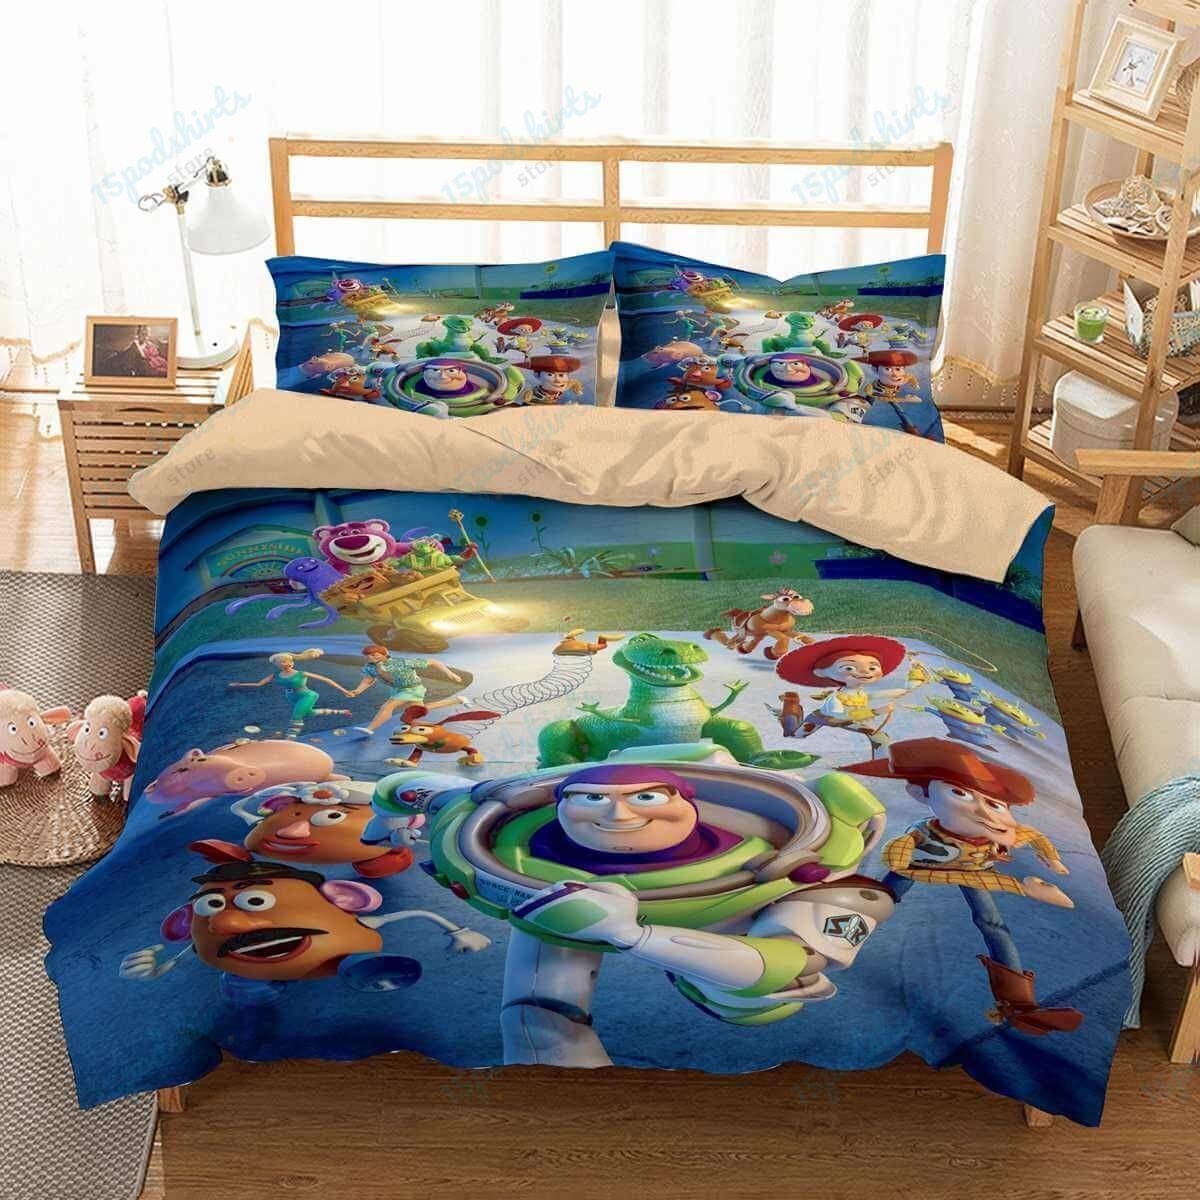 Toy Story 1 Duvet Cover Bedding Set